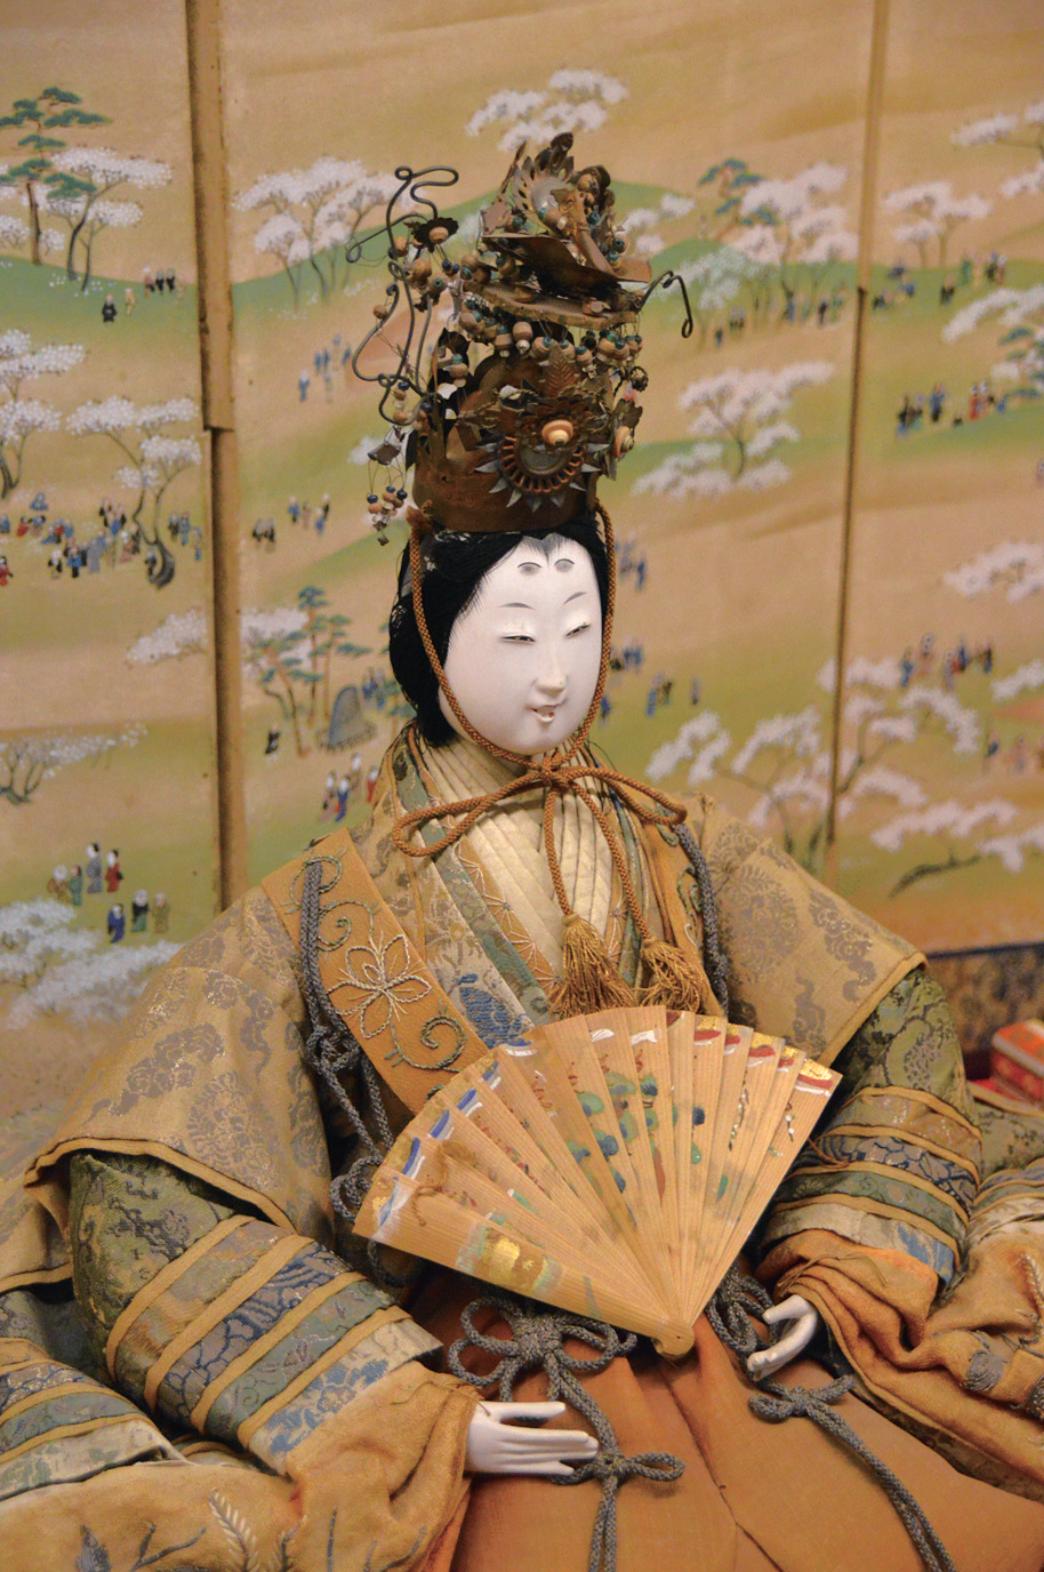 松井章之・琴姫夫妻の長女加屋姫所用の古今雛